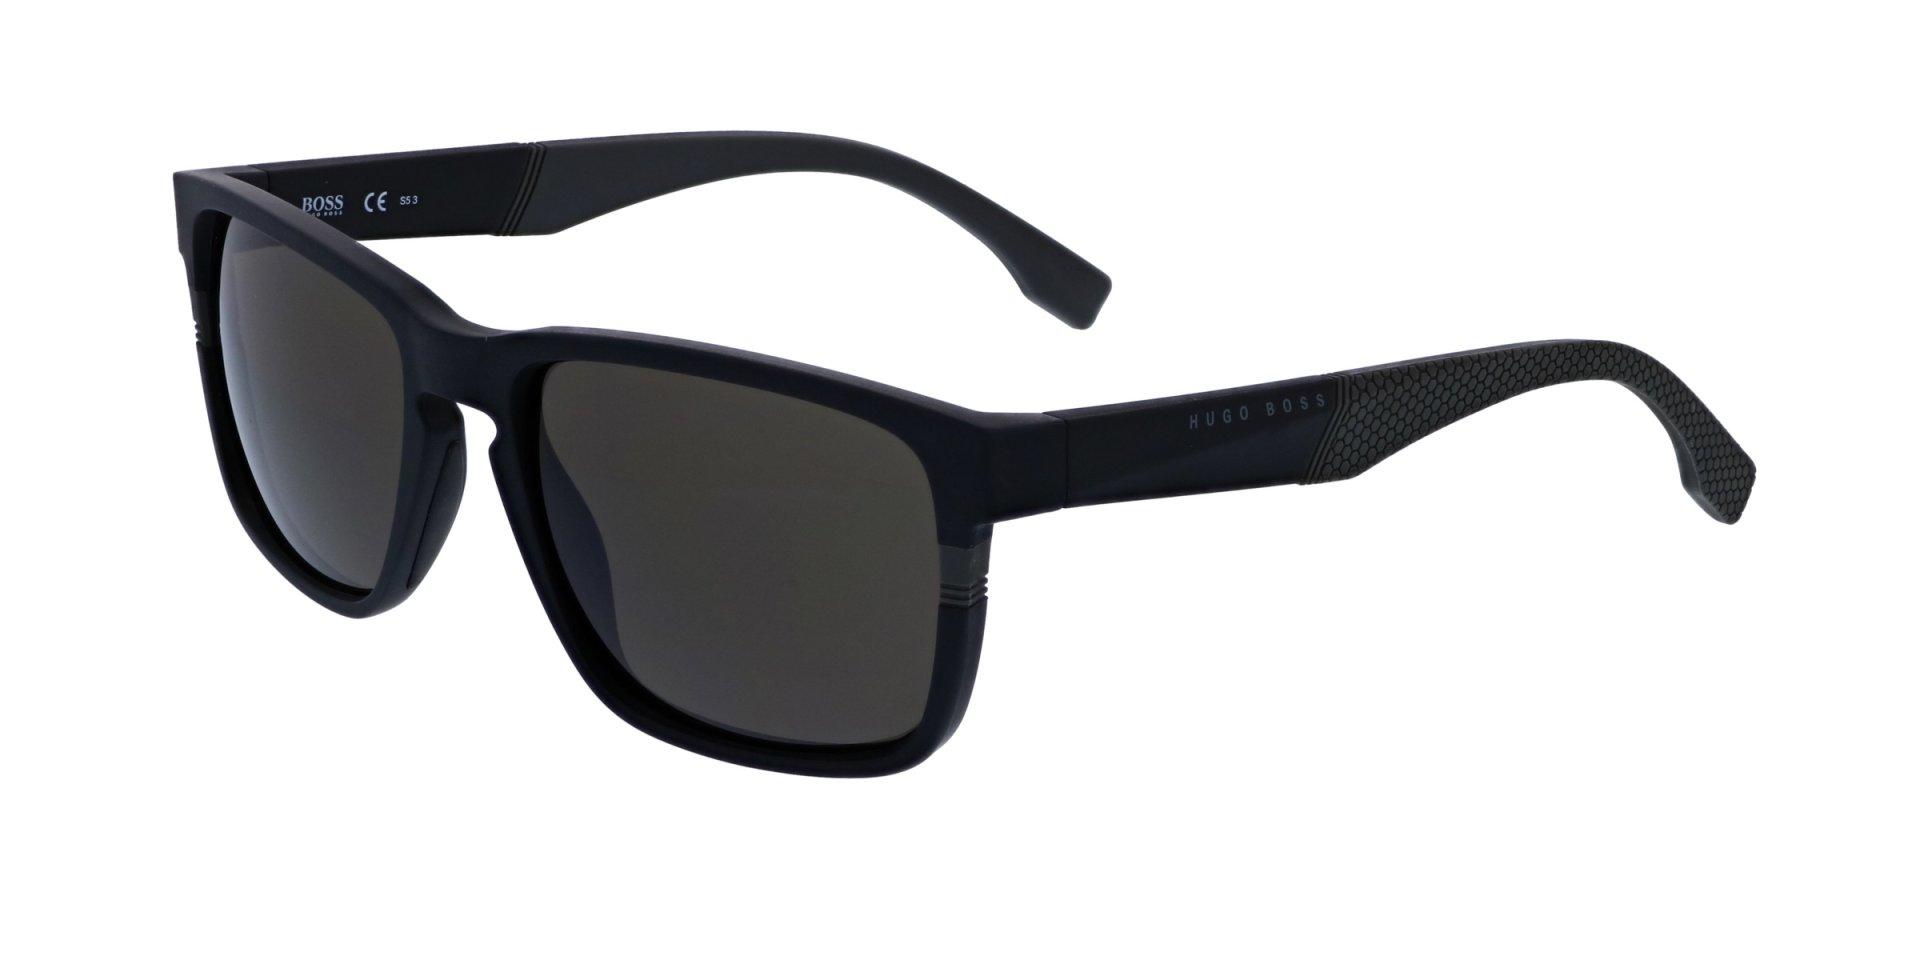 Hugo Boss 0916S 1X1NR Sonnenbrille qzsiHrMN